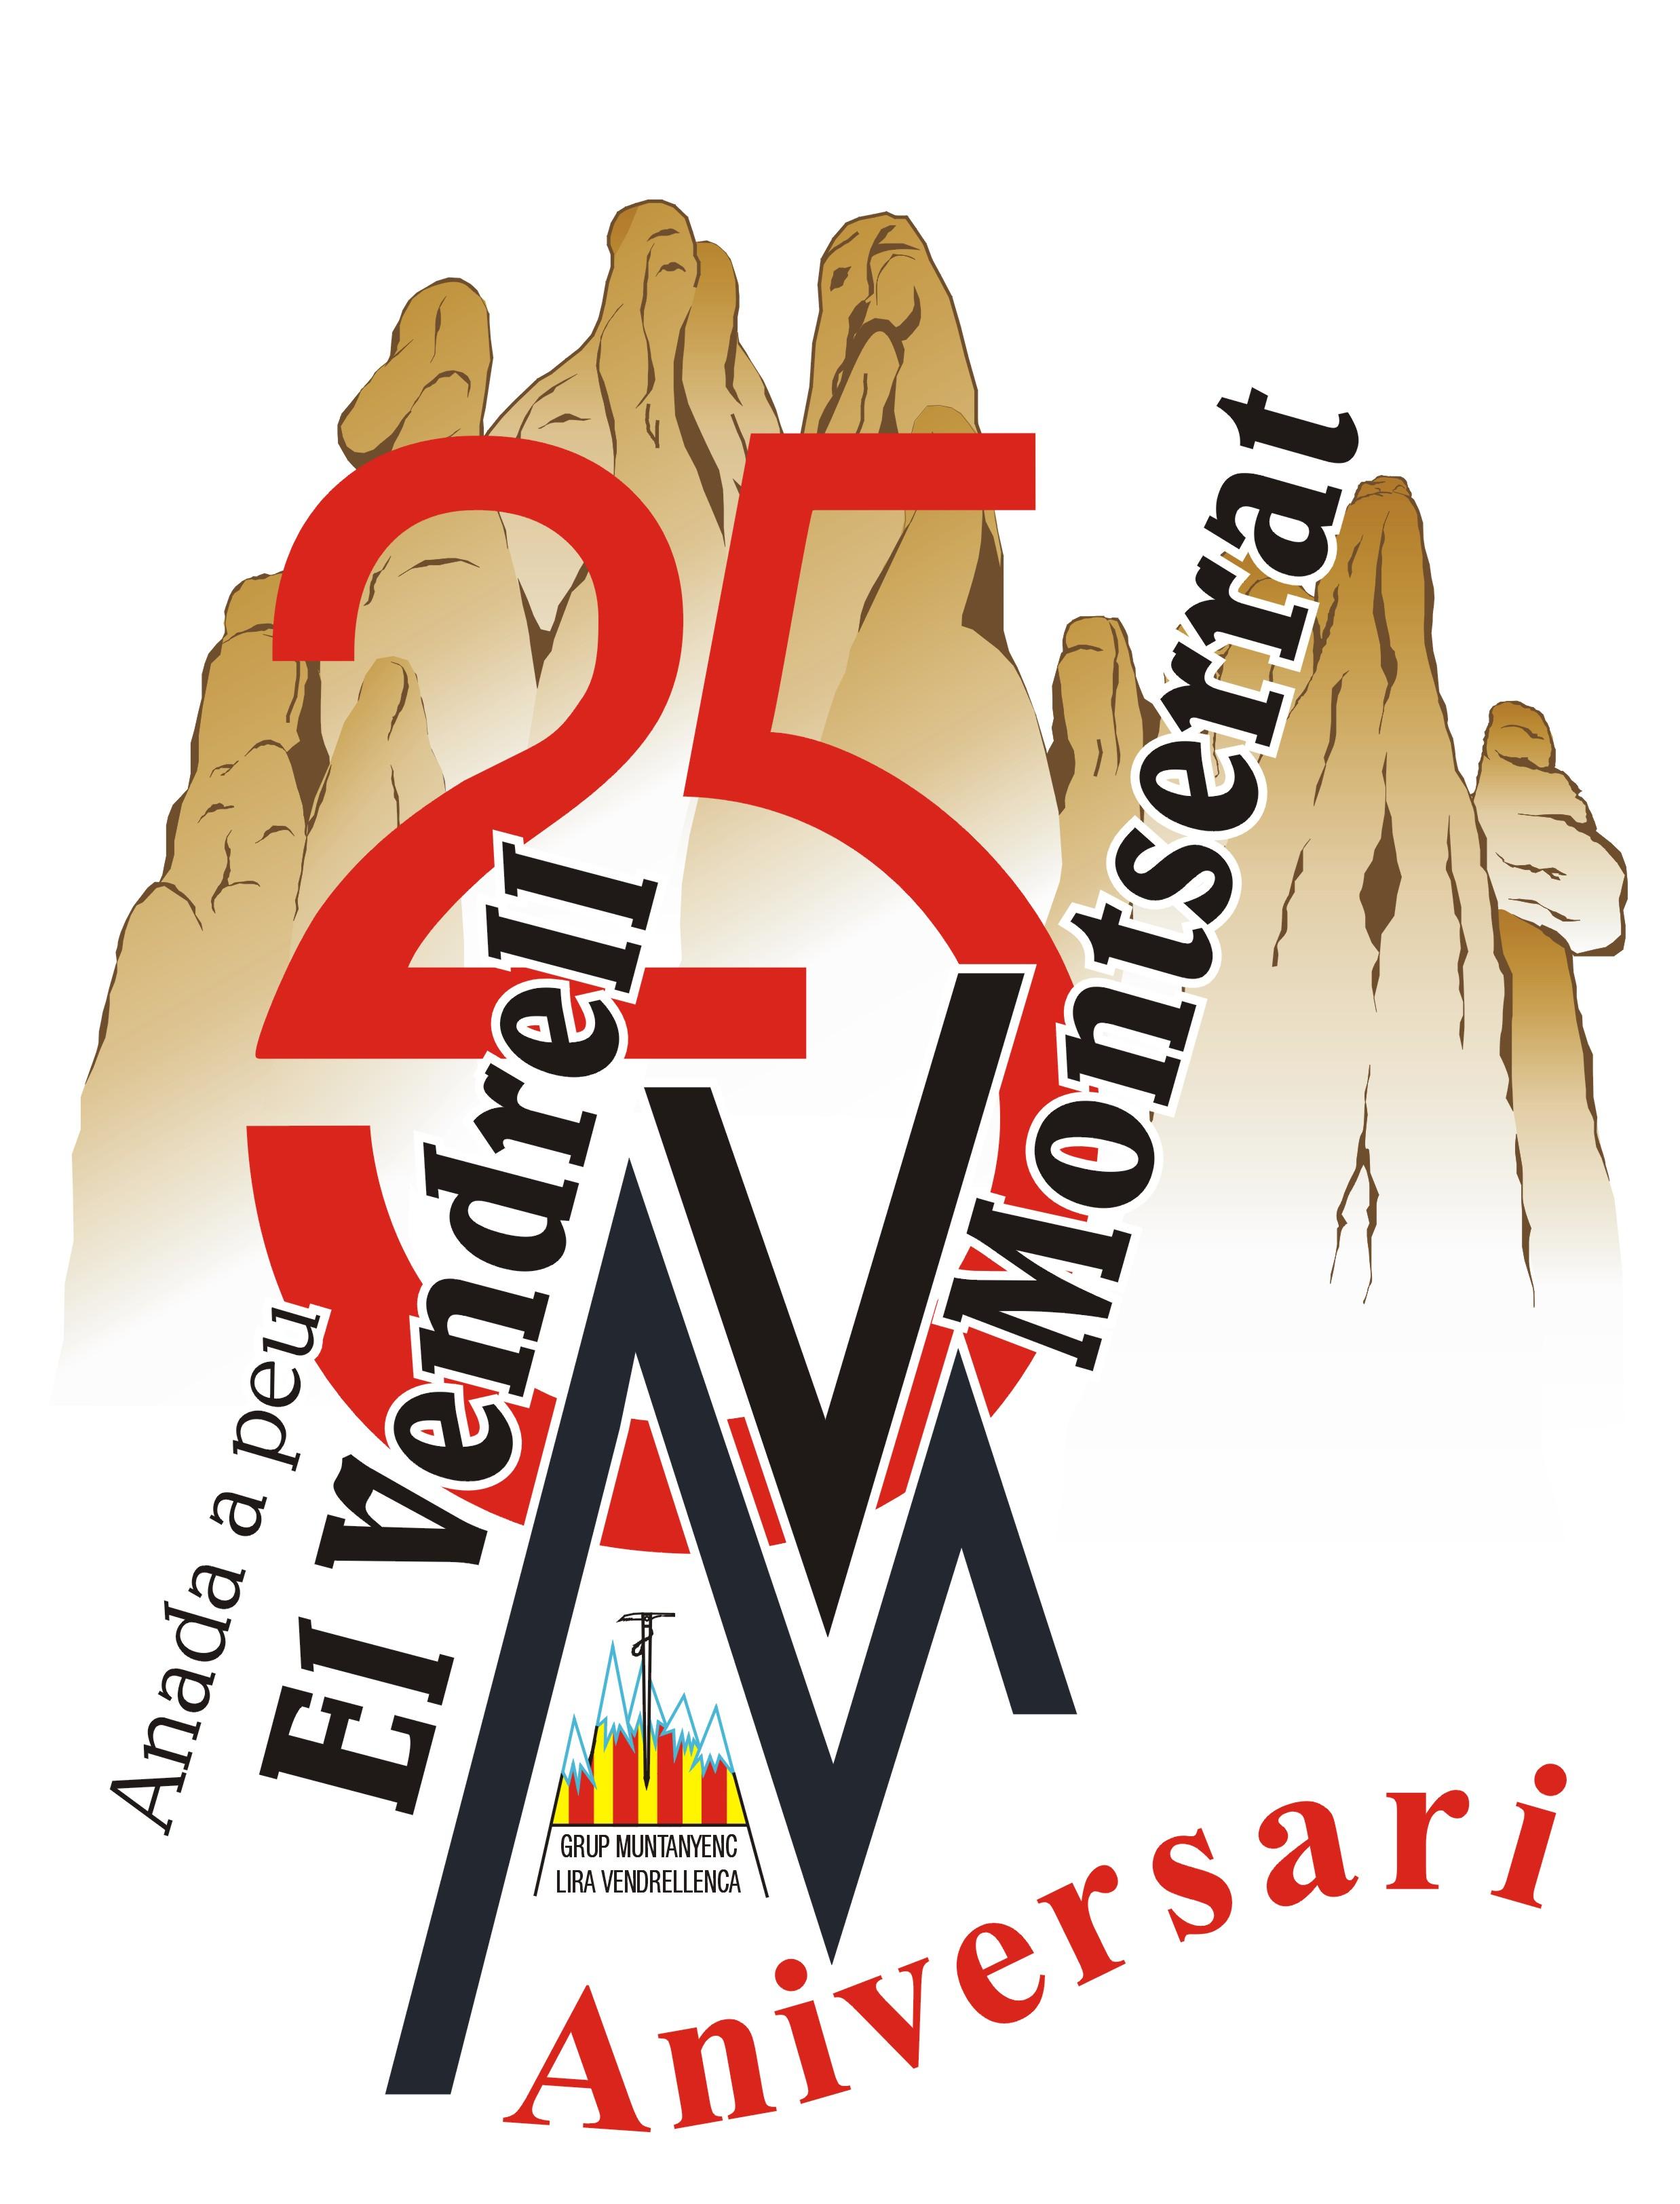 EL VEN-MONT 2015 - logo color